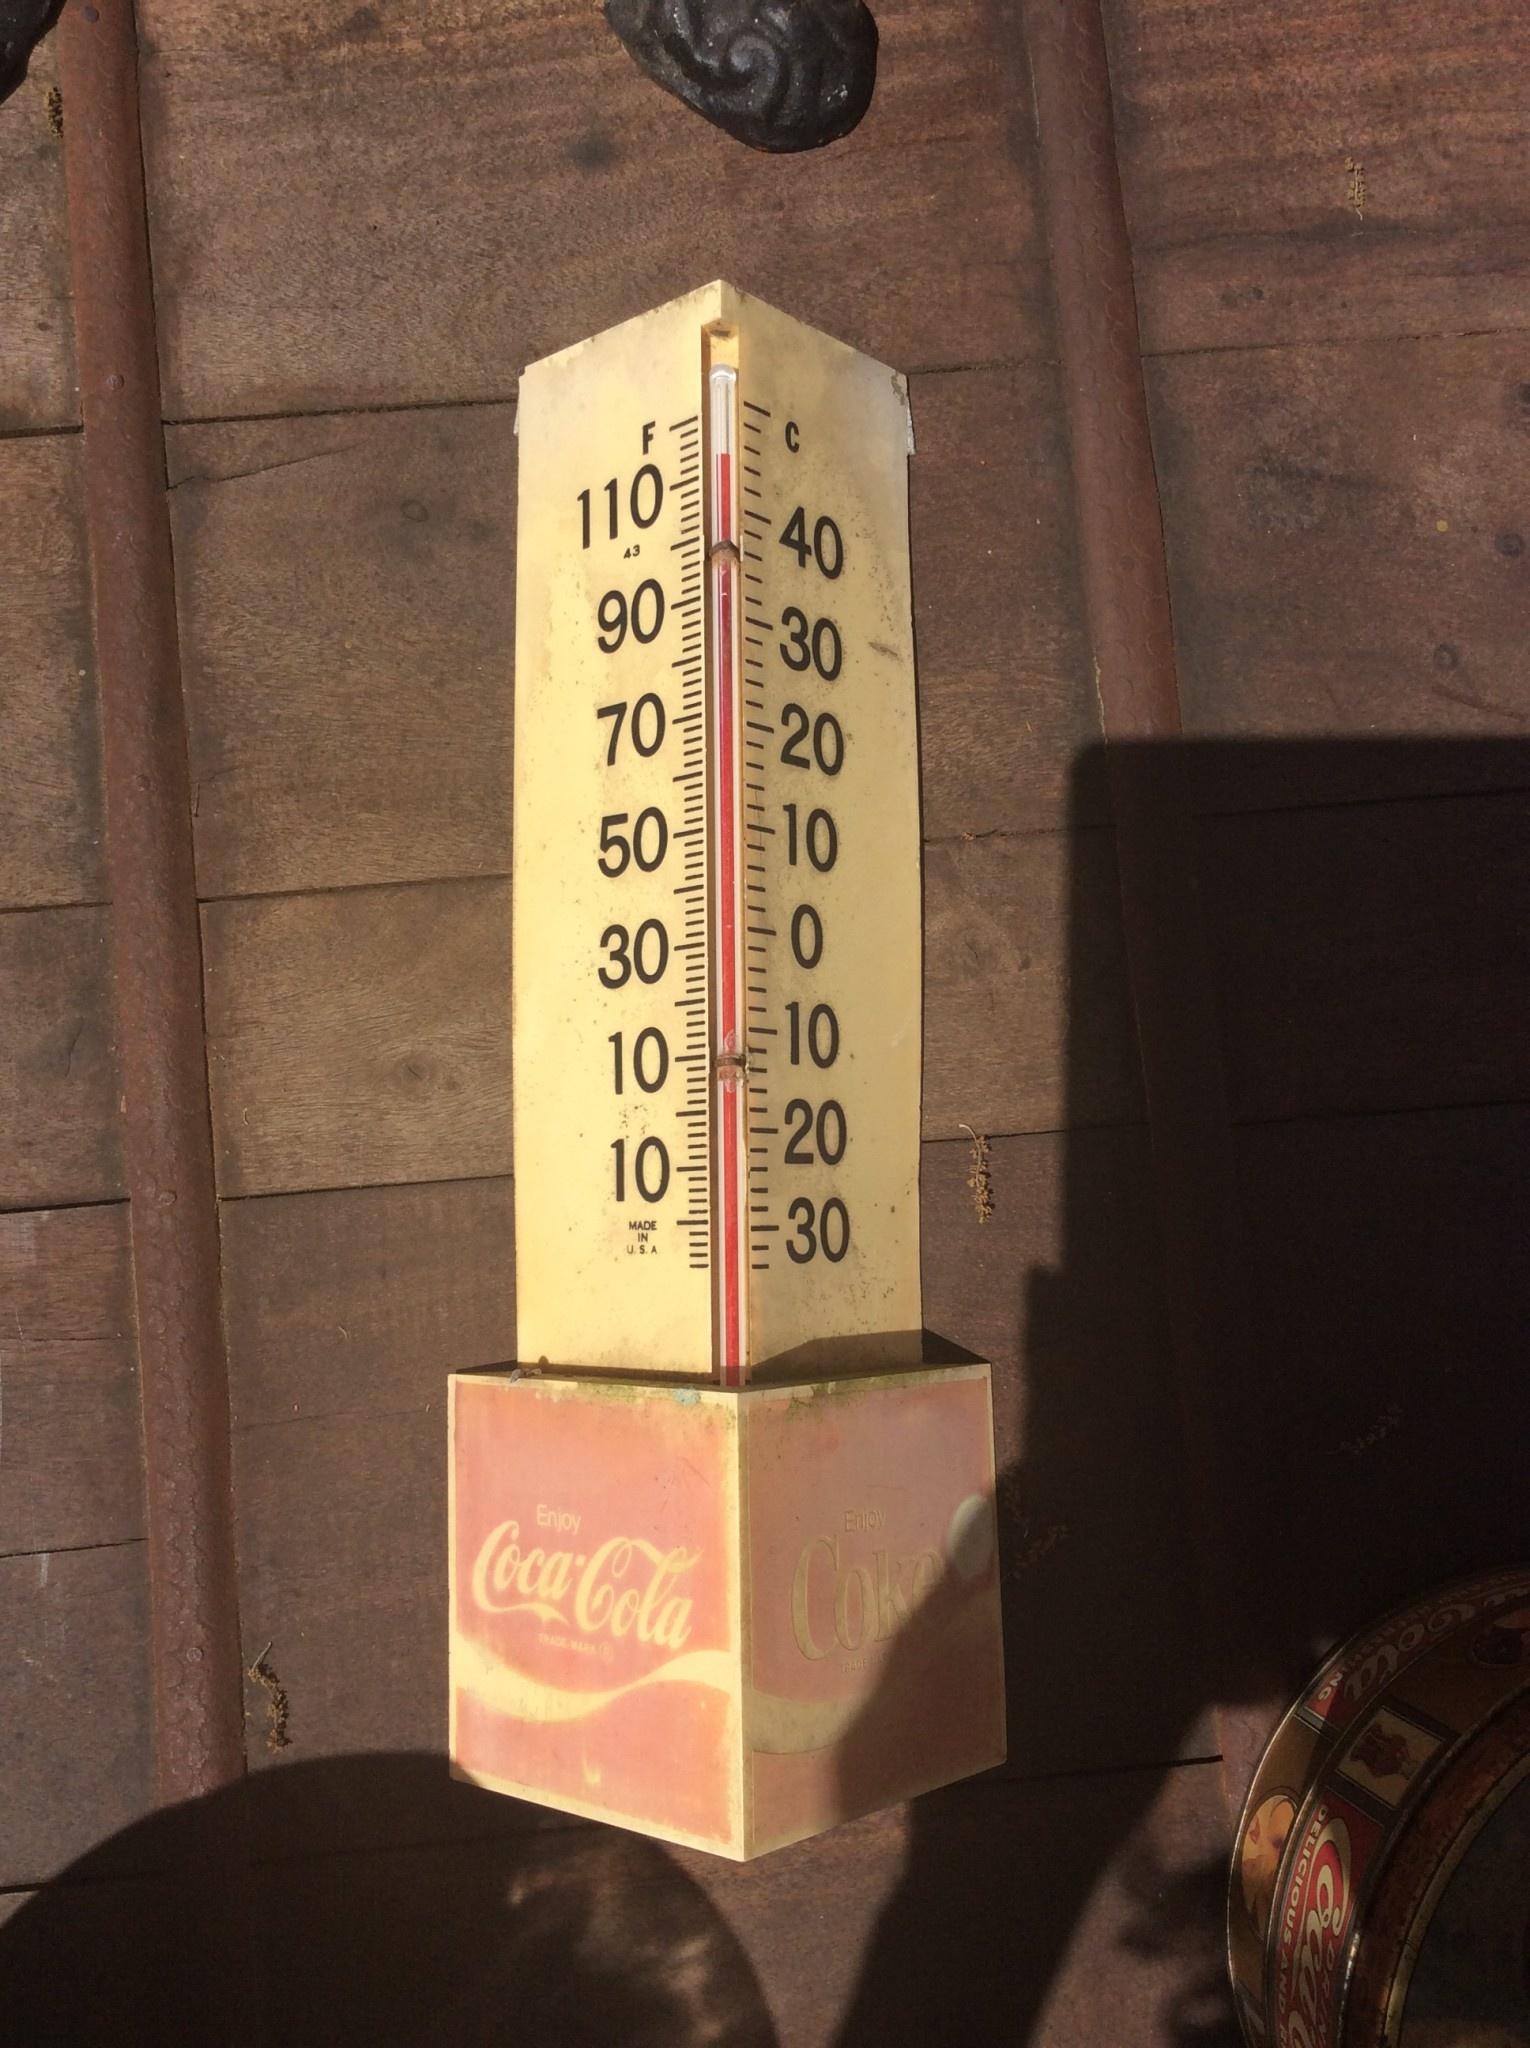 Coke thermometer